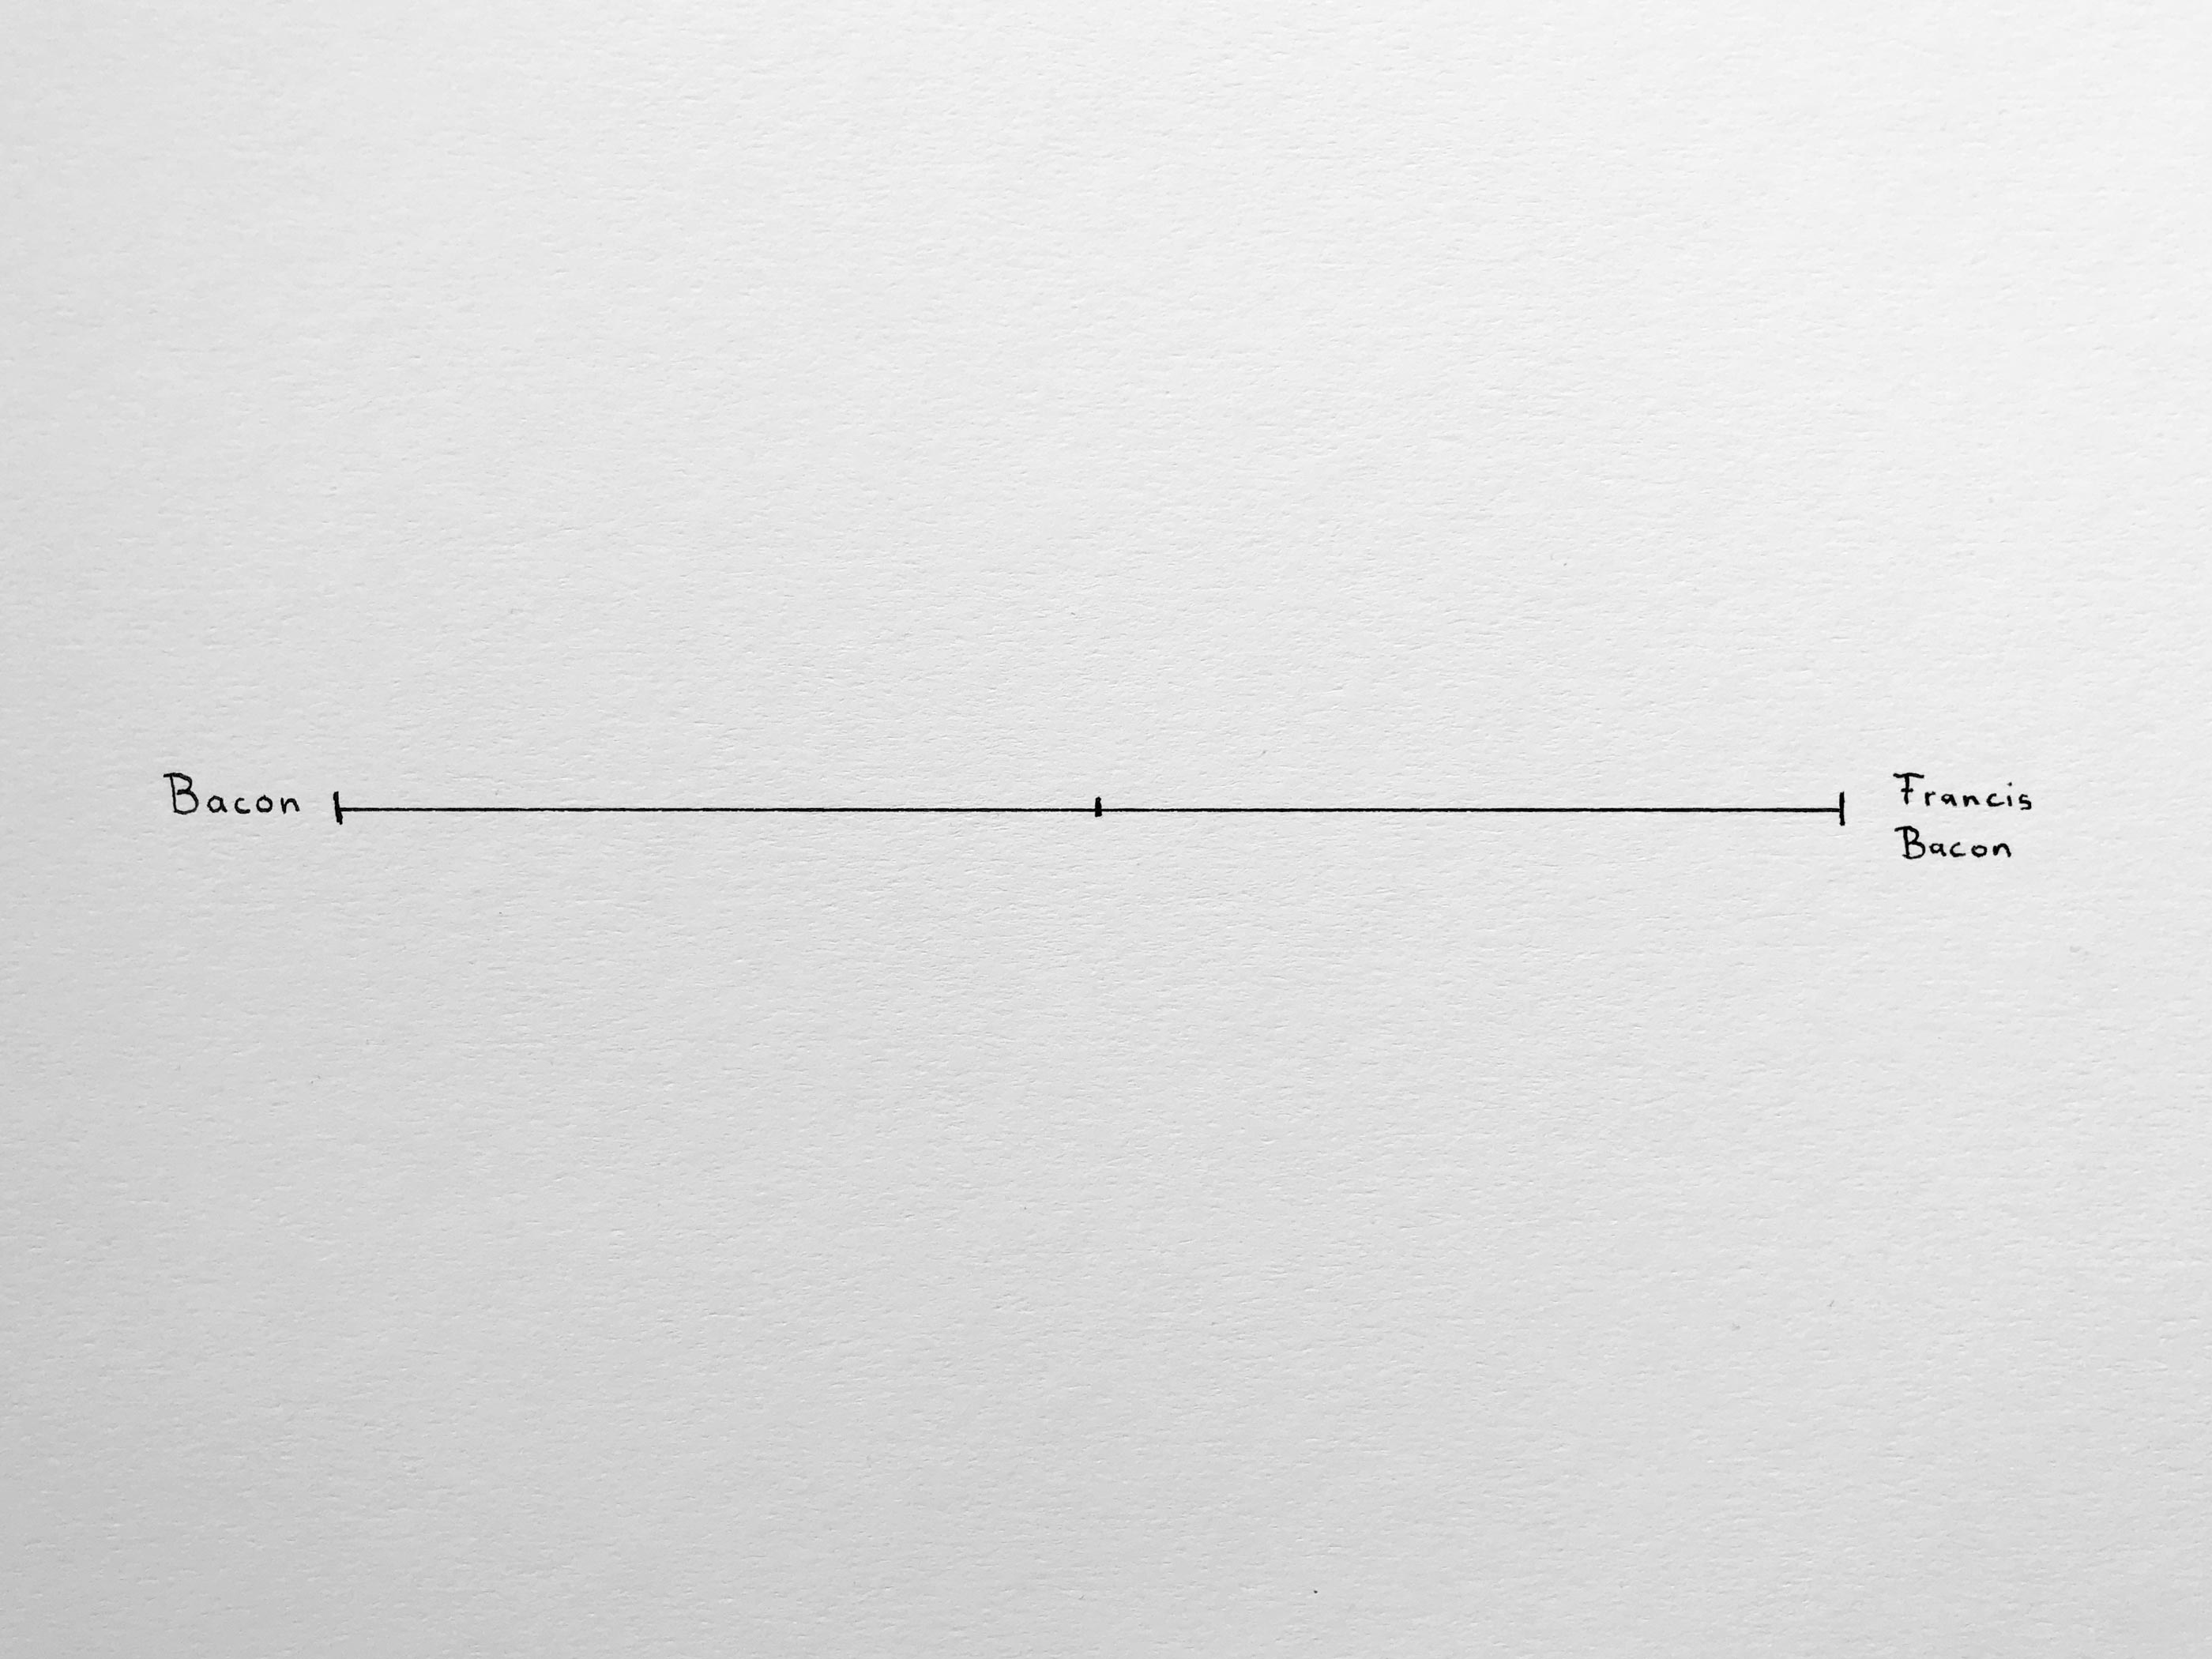 Odd Parameters: Bacon-Francis Bacon, Pen on Paper, 32x24cm, 2018